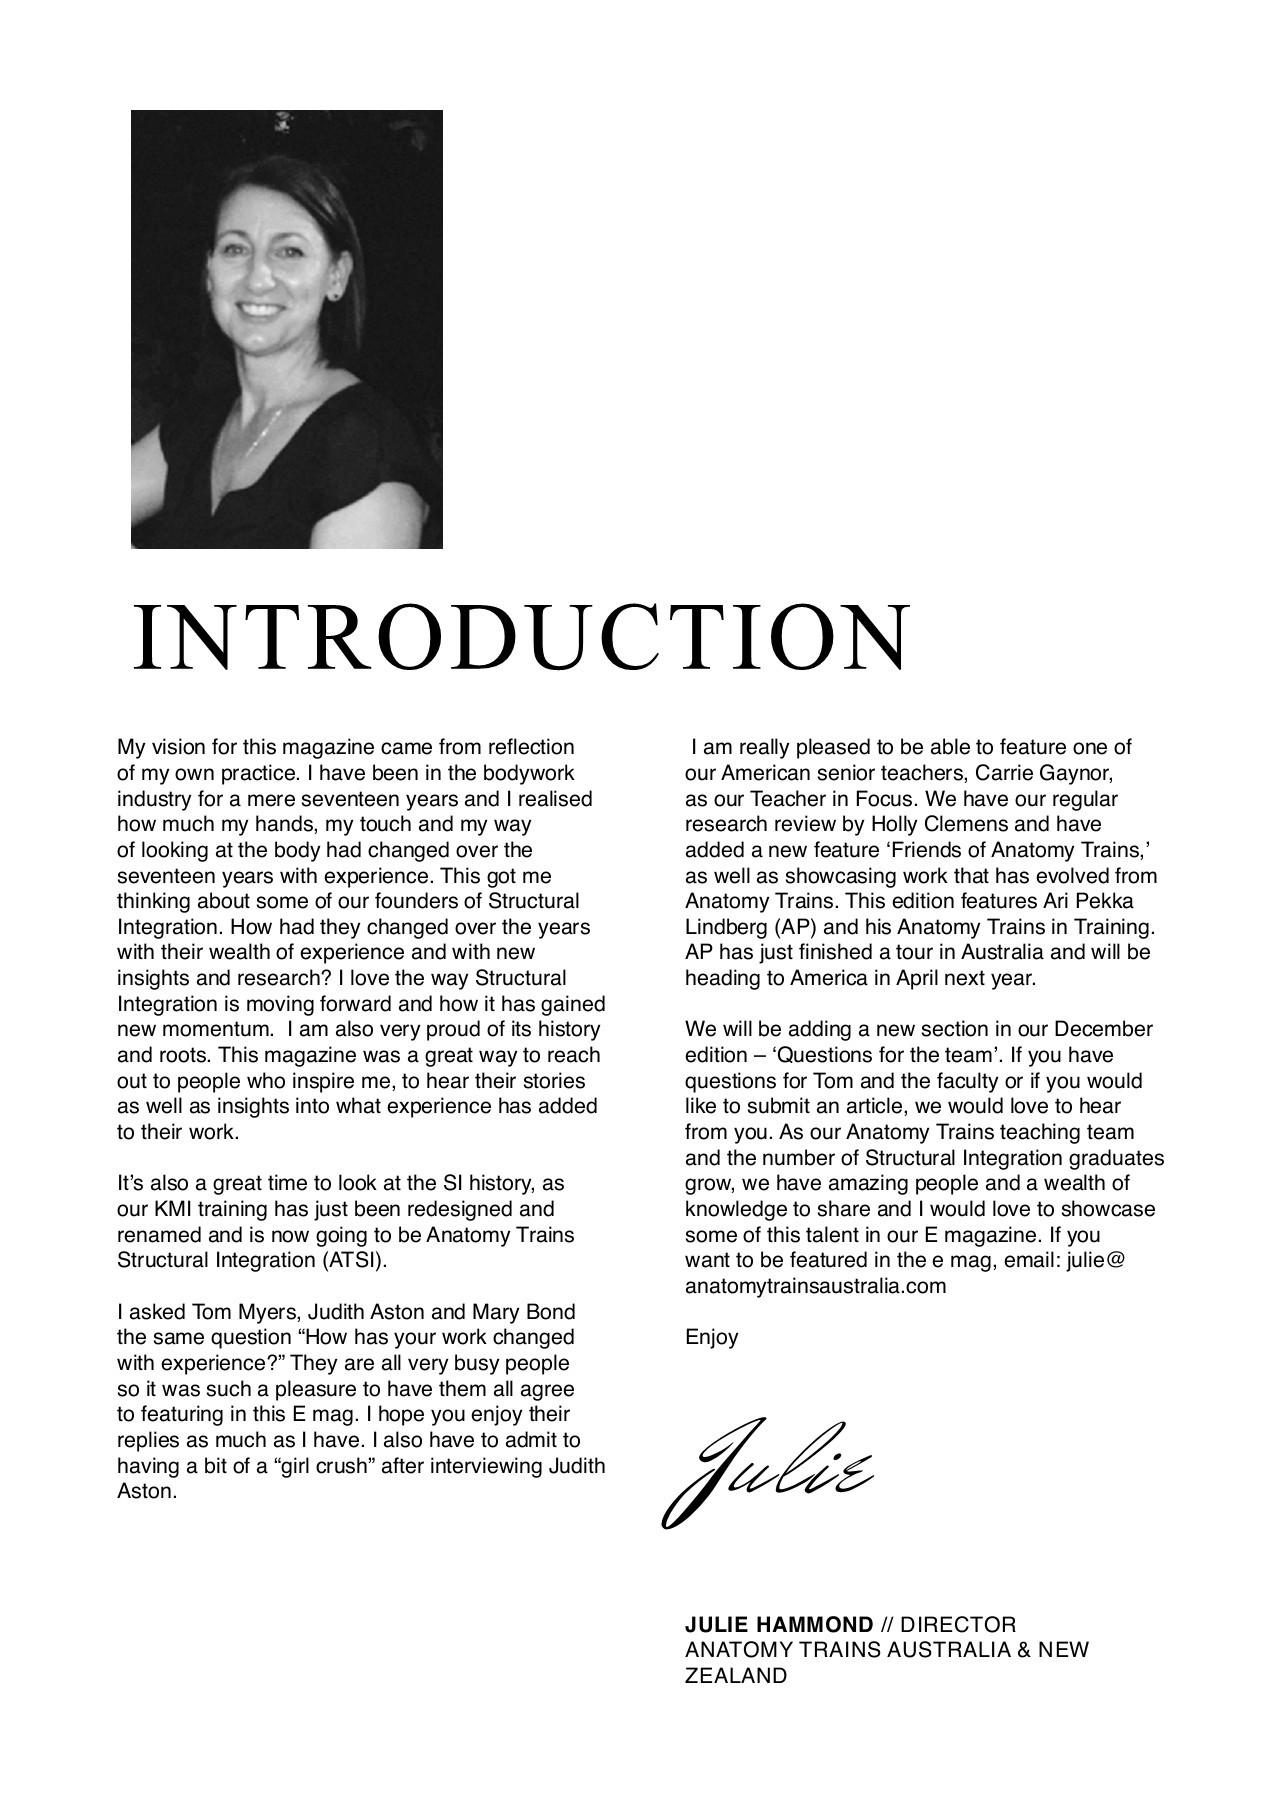 Anatomy Trains E-Magazine Issue 4 - Judith Aston Interview